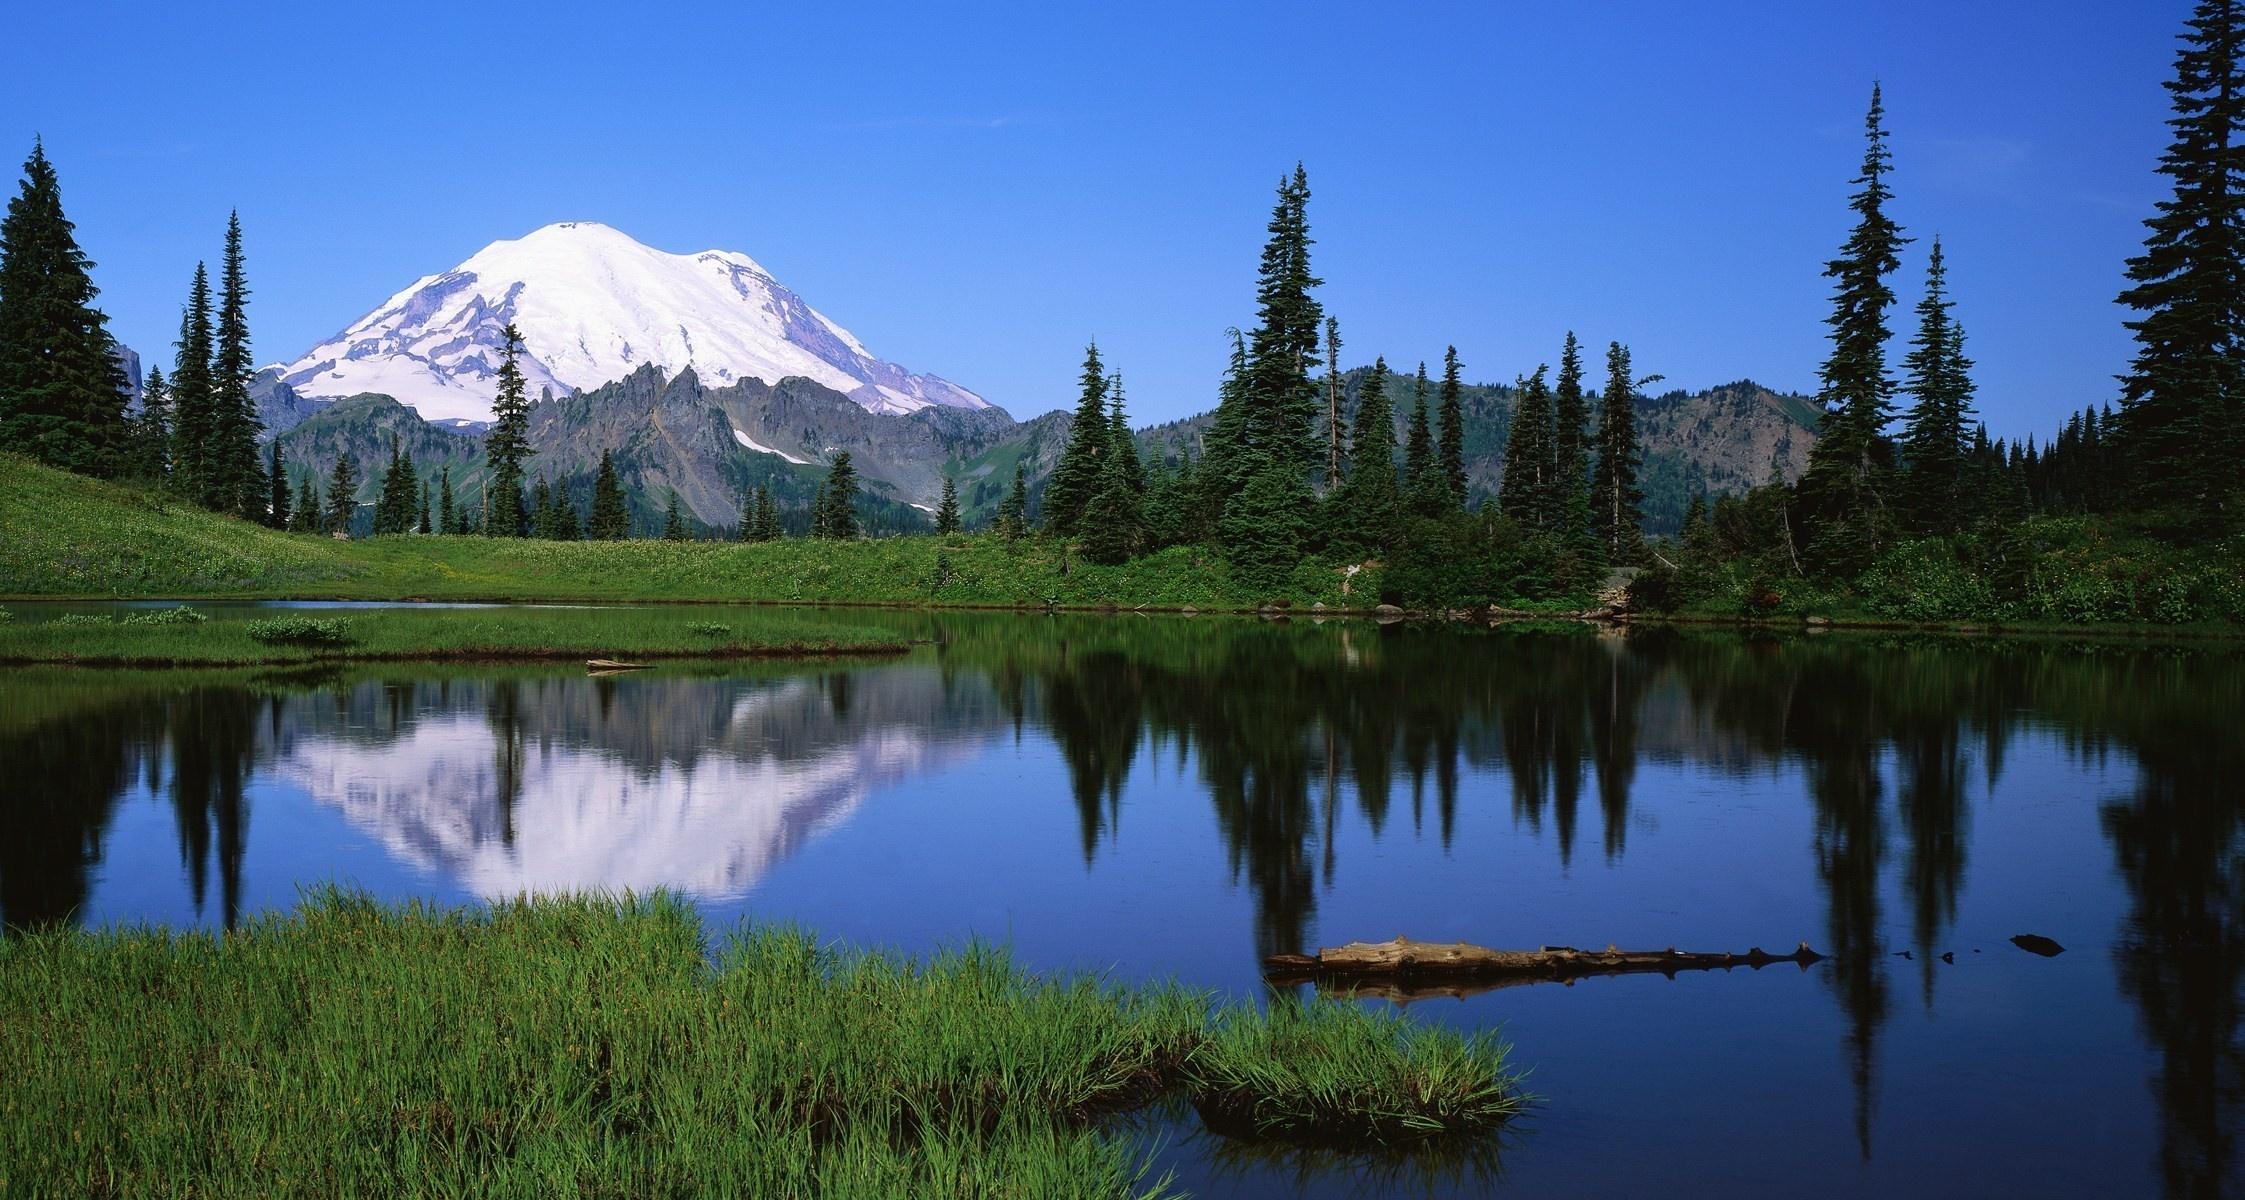 Wallpaper mount rainier national park sunrise grass mountains 2245x1200